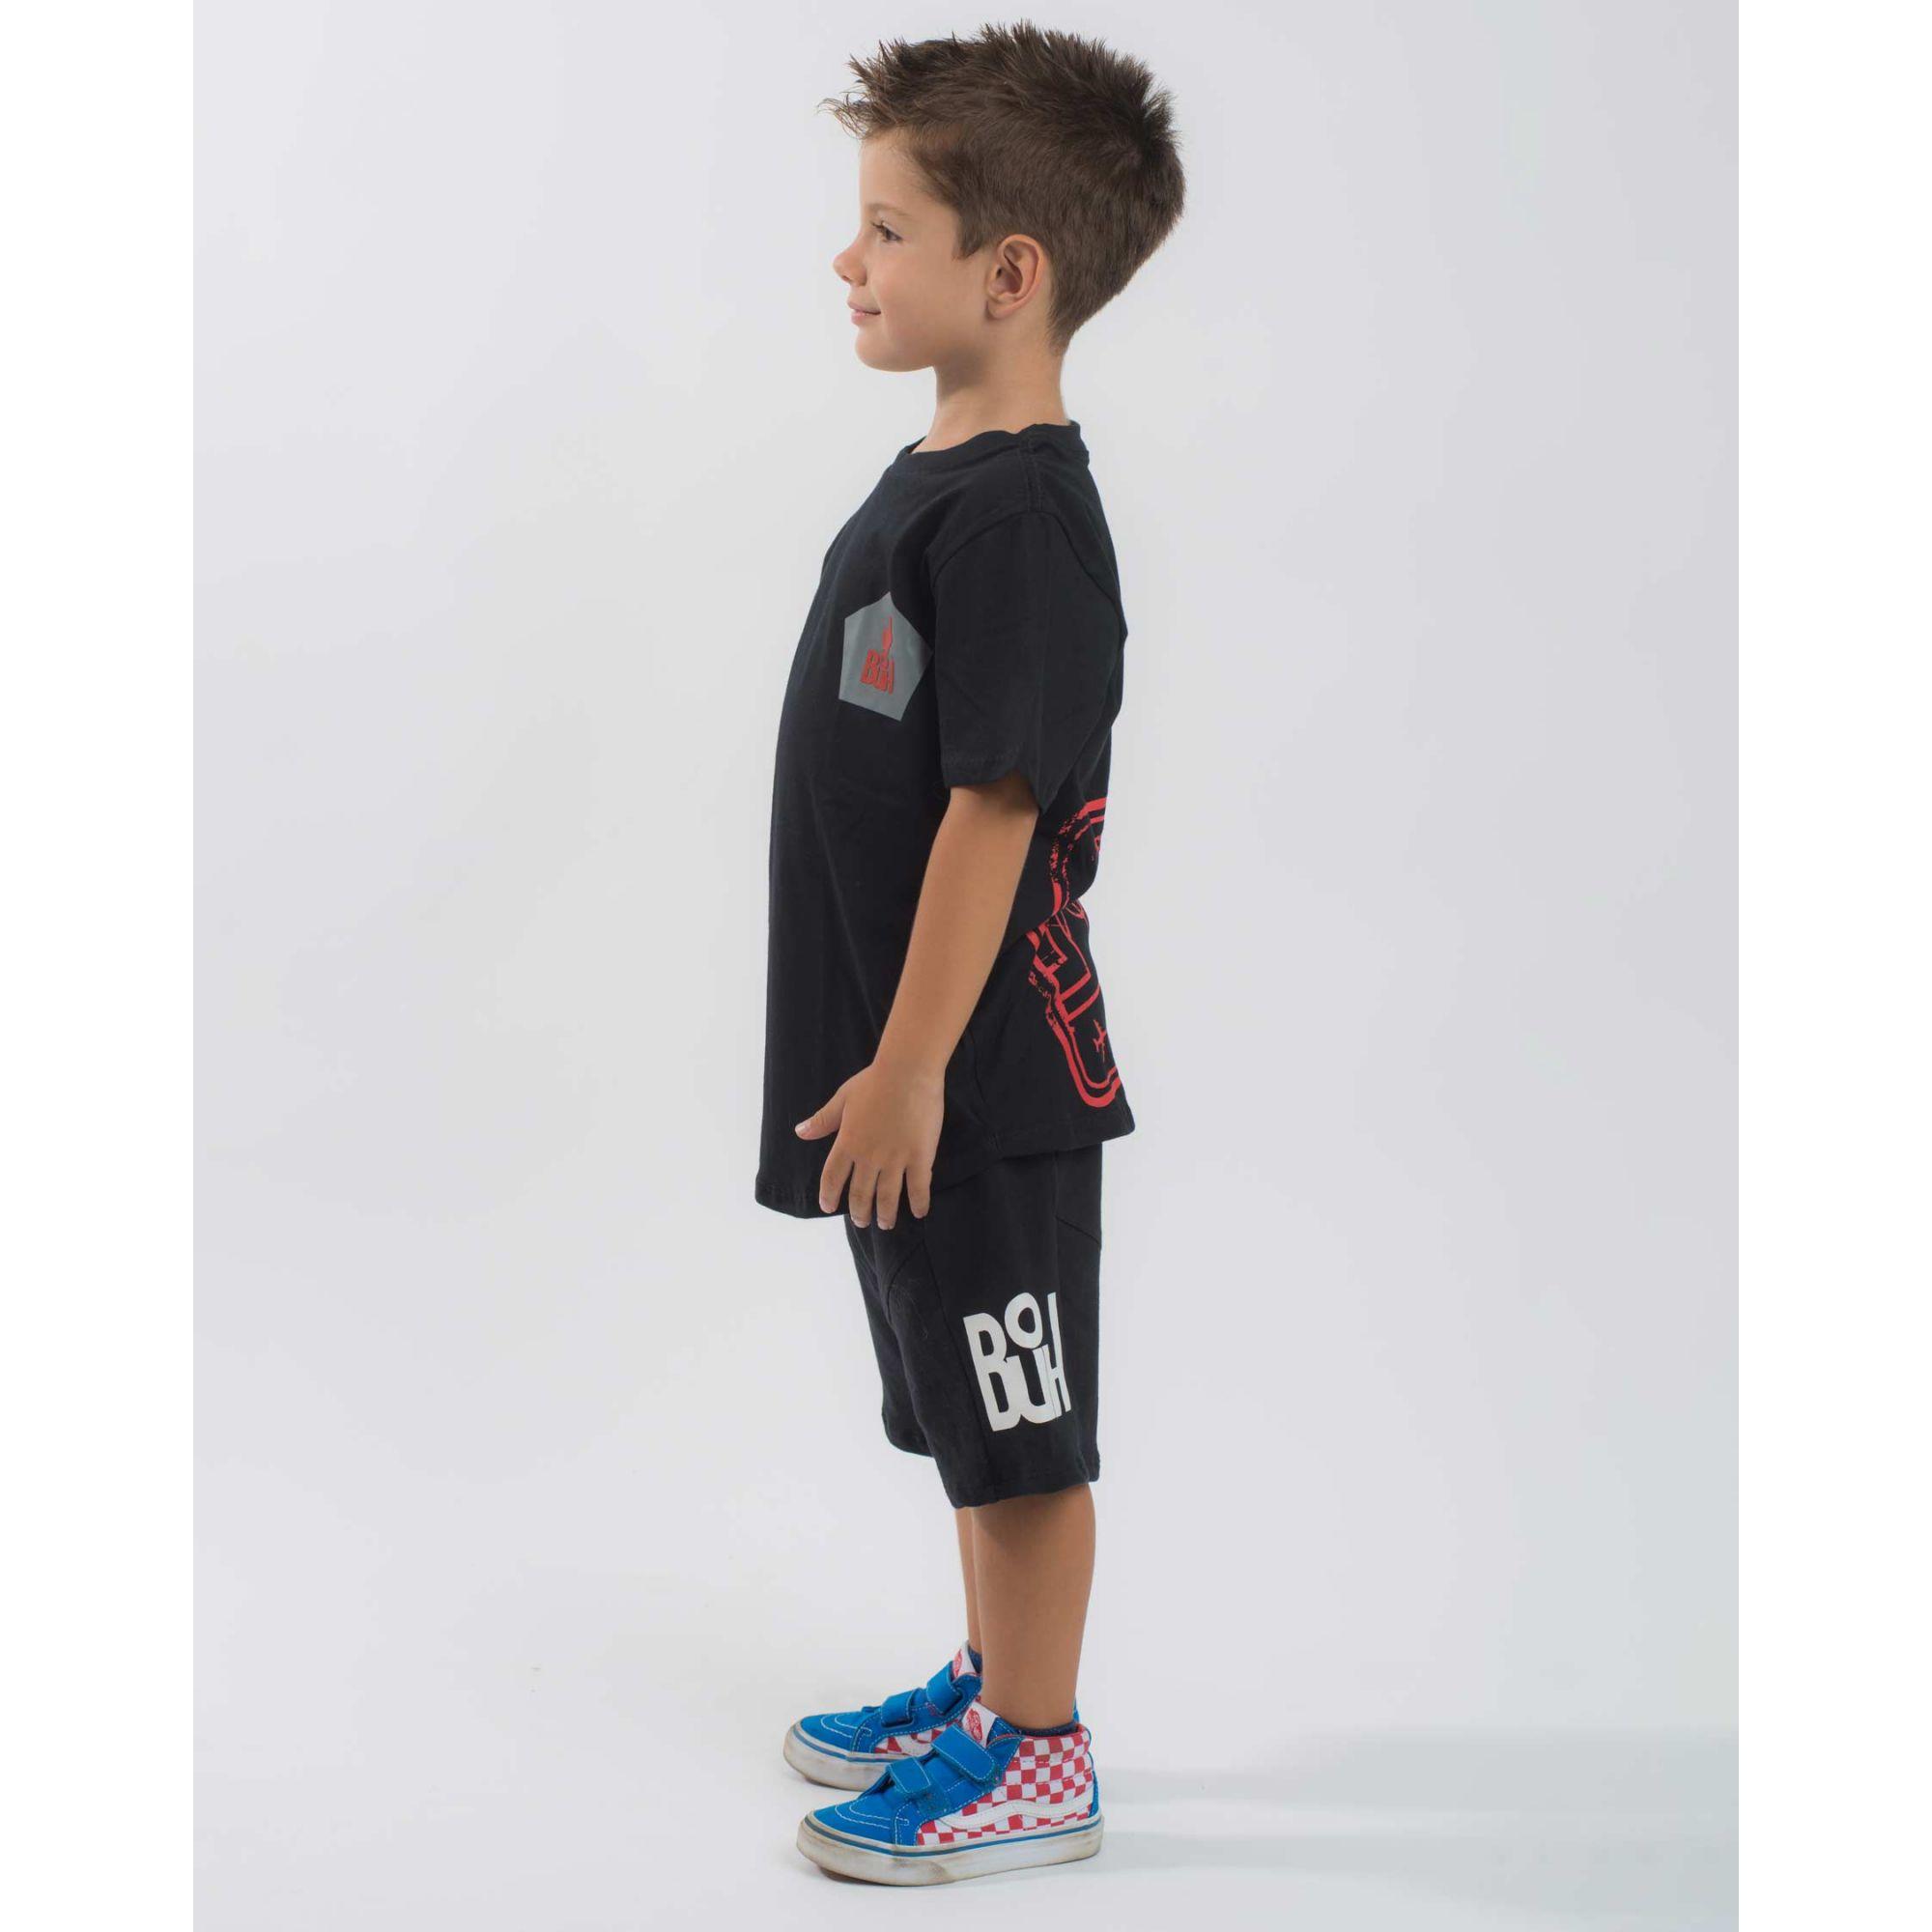 Camiseta Buh Kids Post Soccer Black